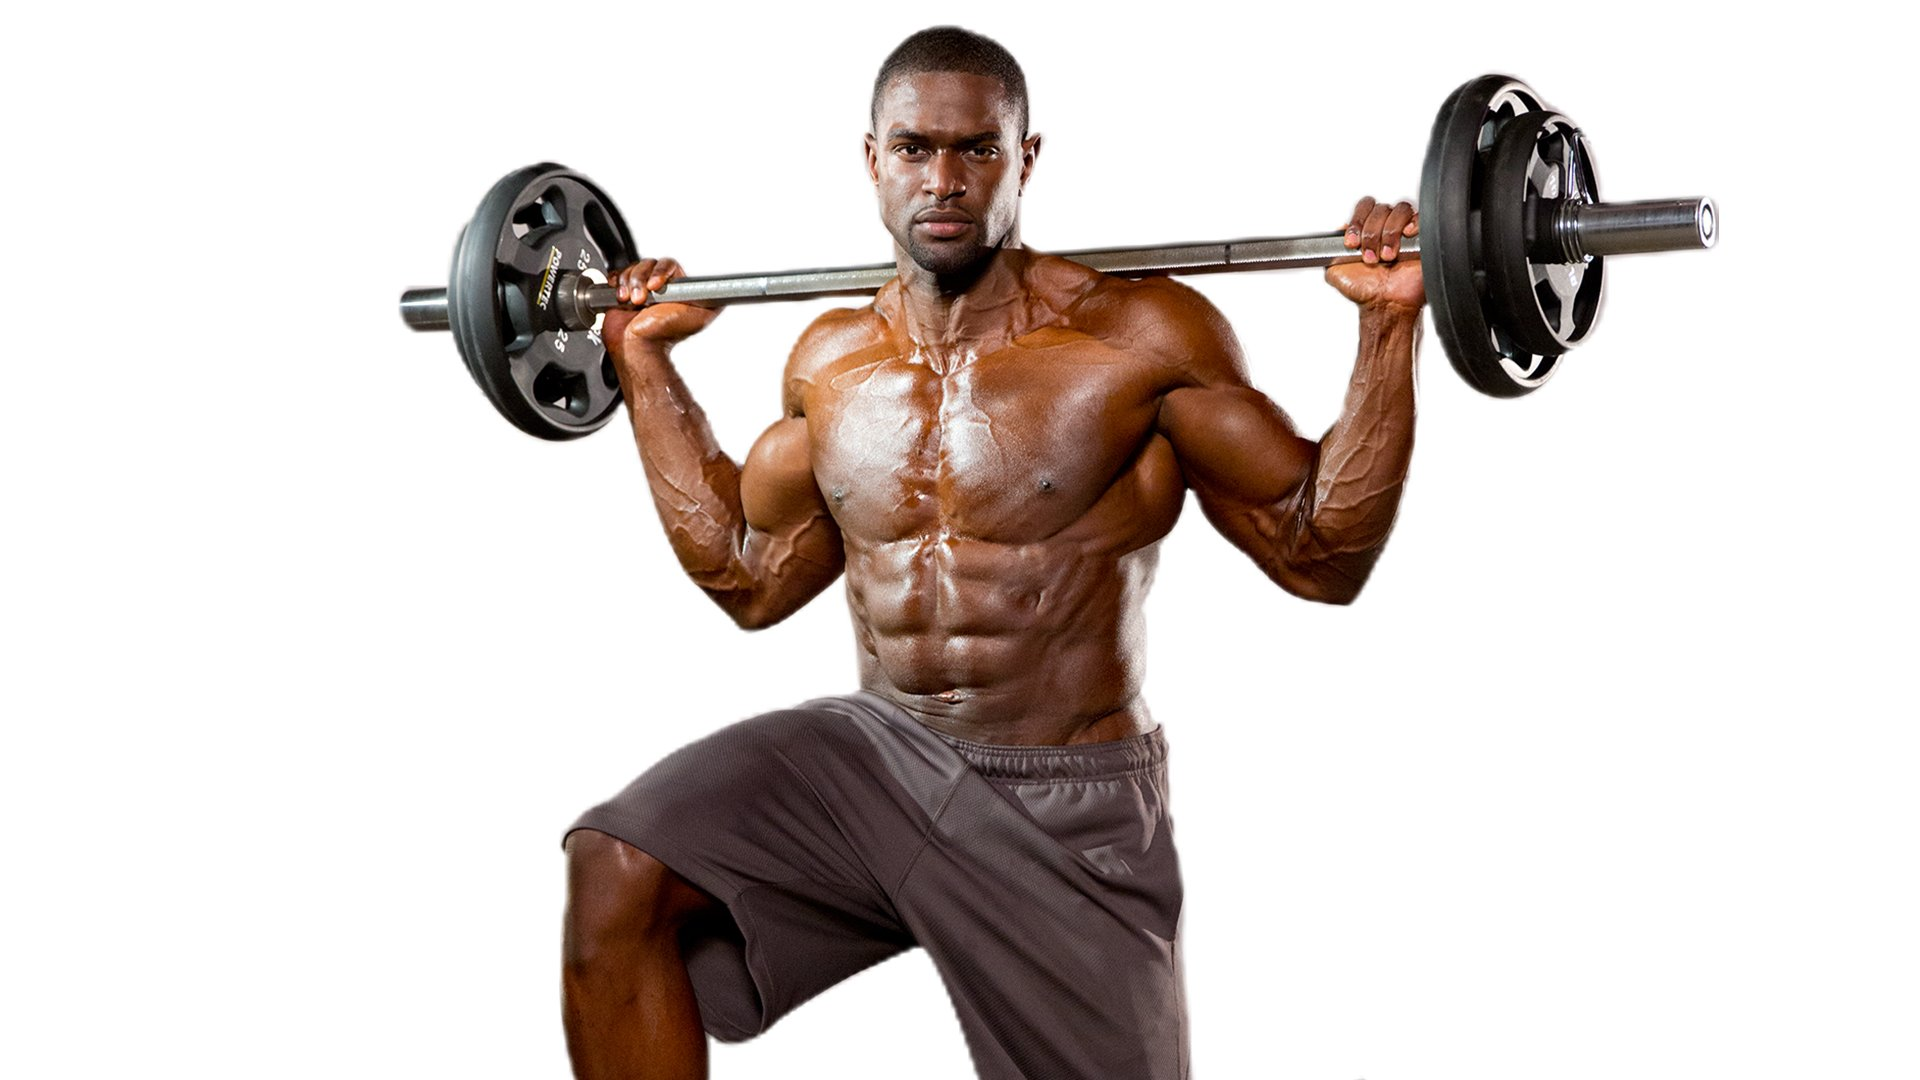 Start Here, Start Now: The 8-Week Beginner Workout Plan